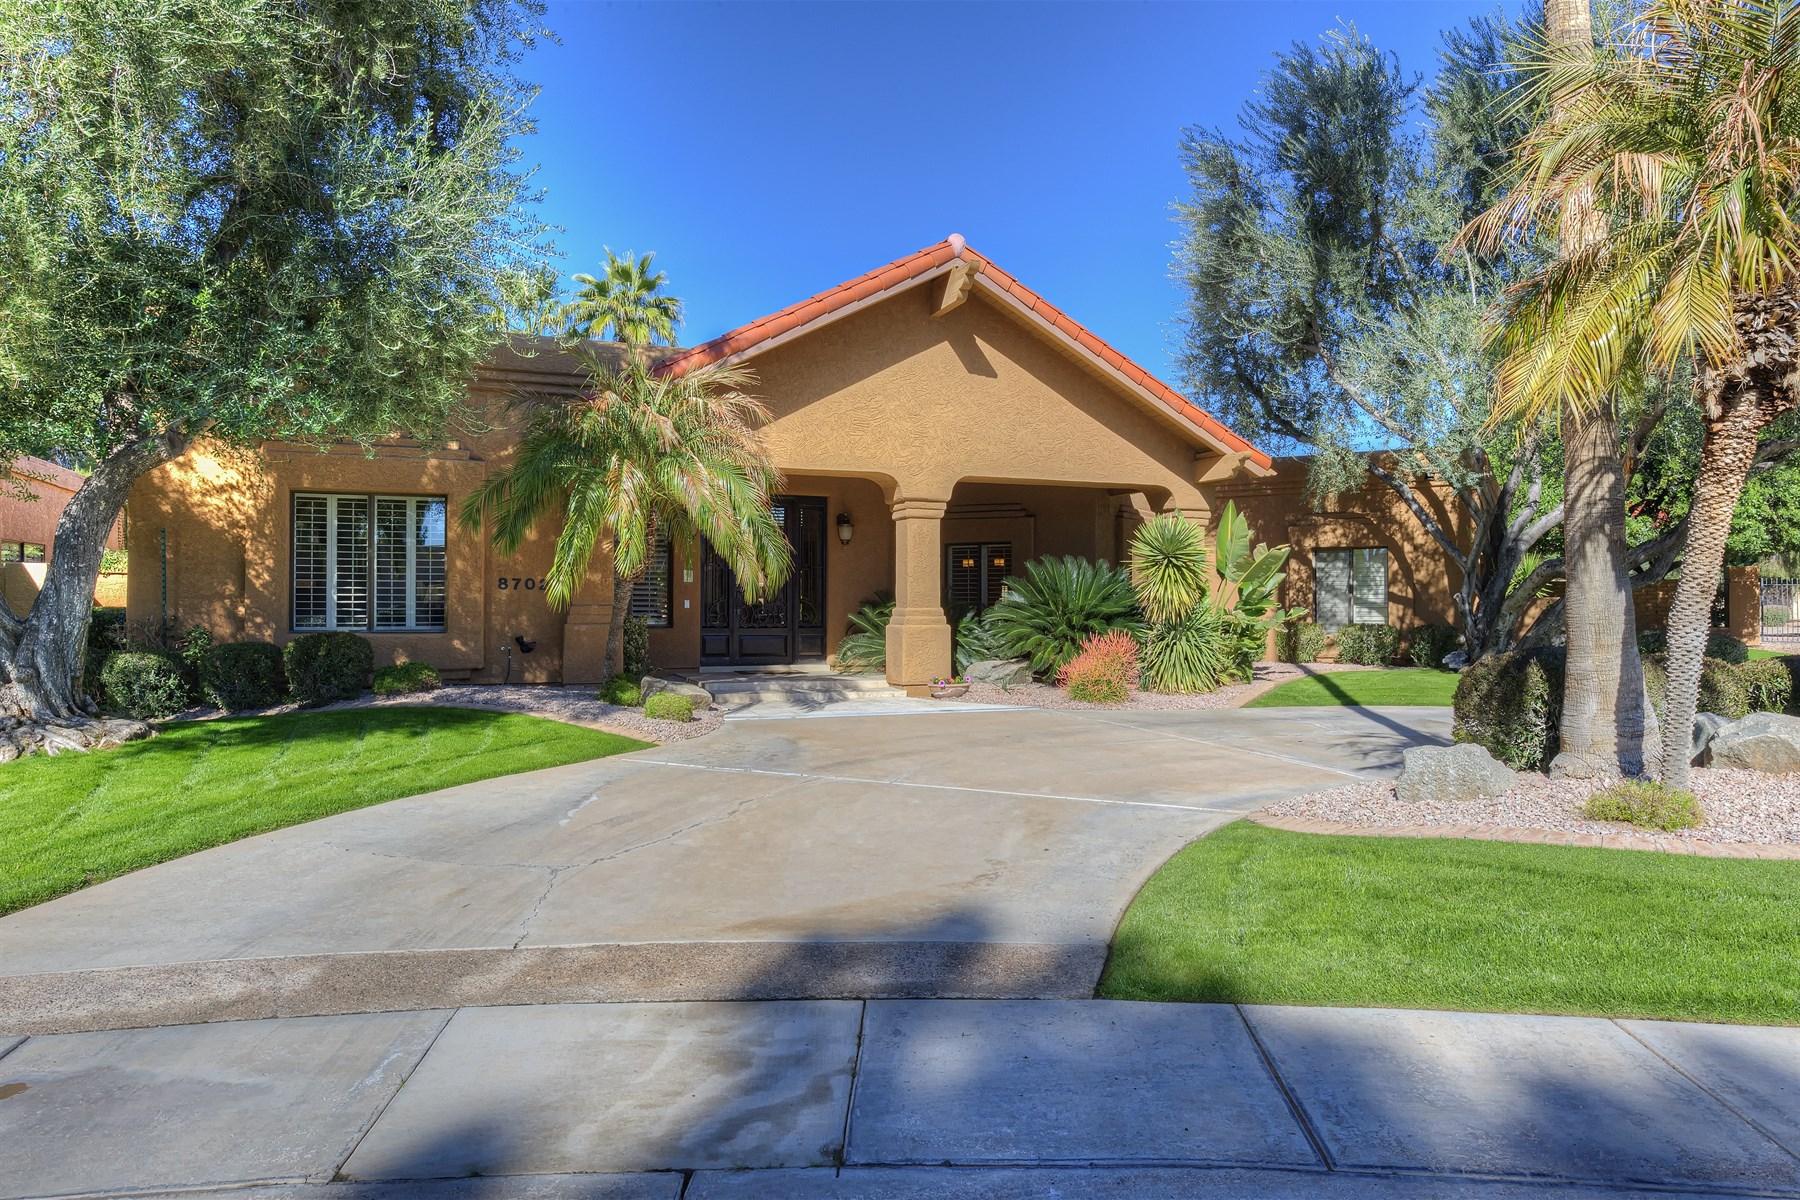 Nhà ở một gia đình vì Bán tại Complete Remodel By One Of The Finest Builders In Paradise Valley & Scottsdale 8702 E San Vicente Drive Scottsdale, Arizona 85258 Hoa Kỳ